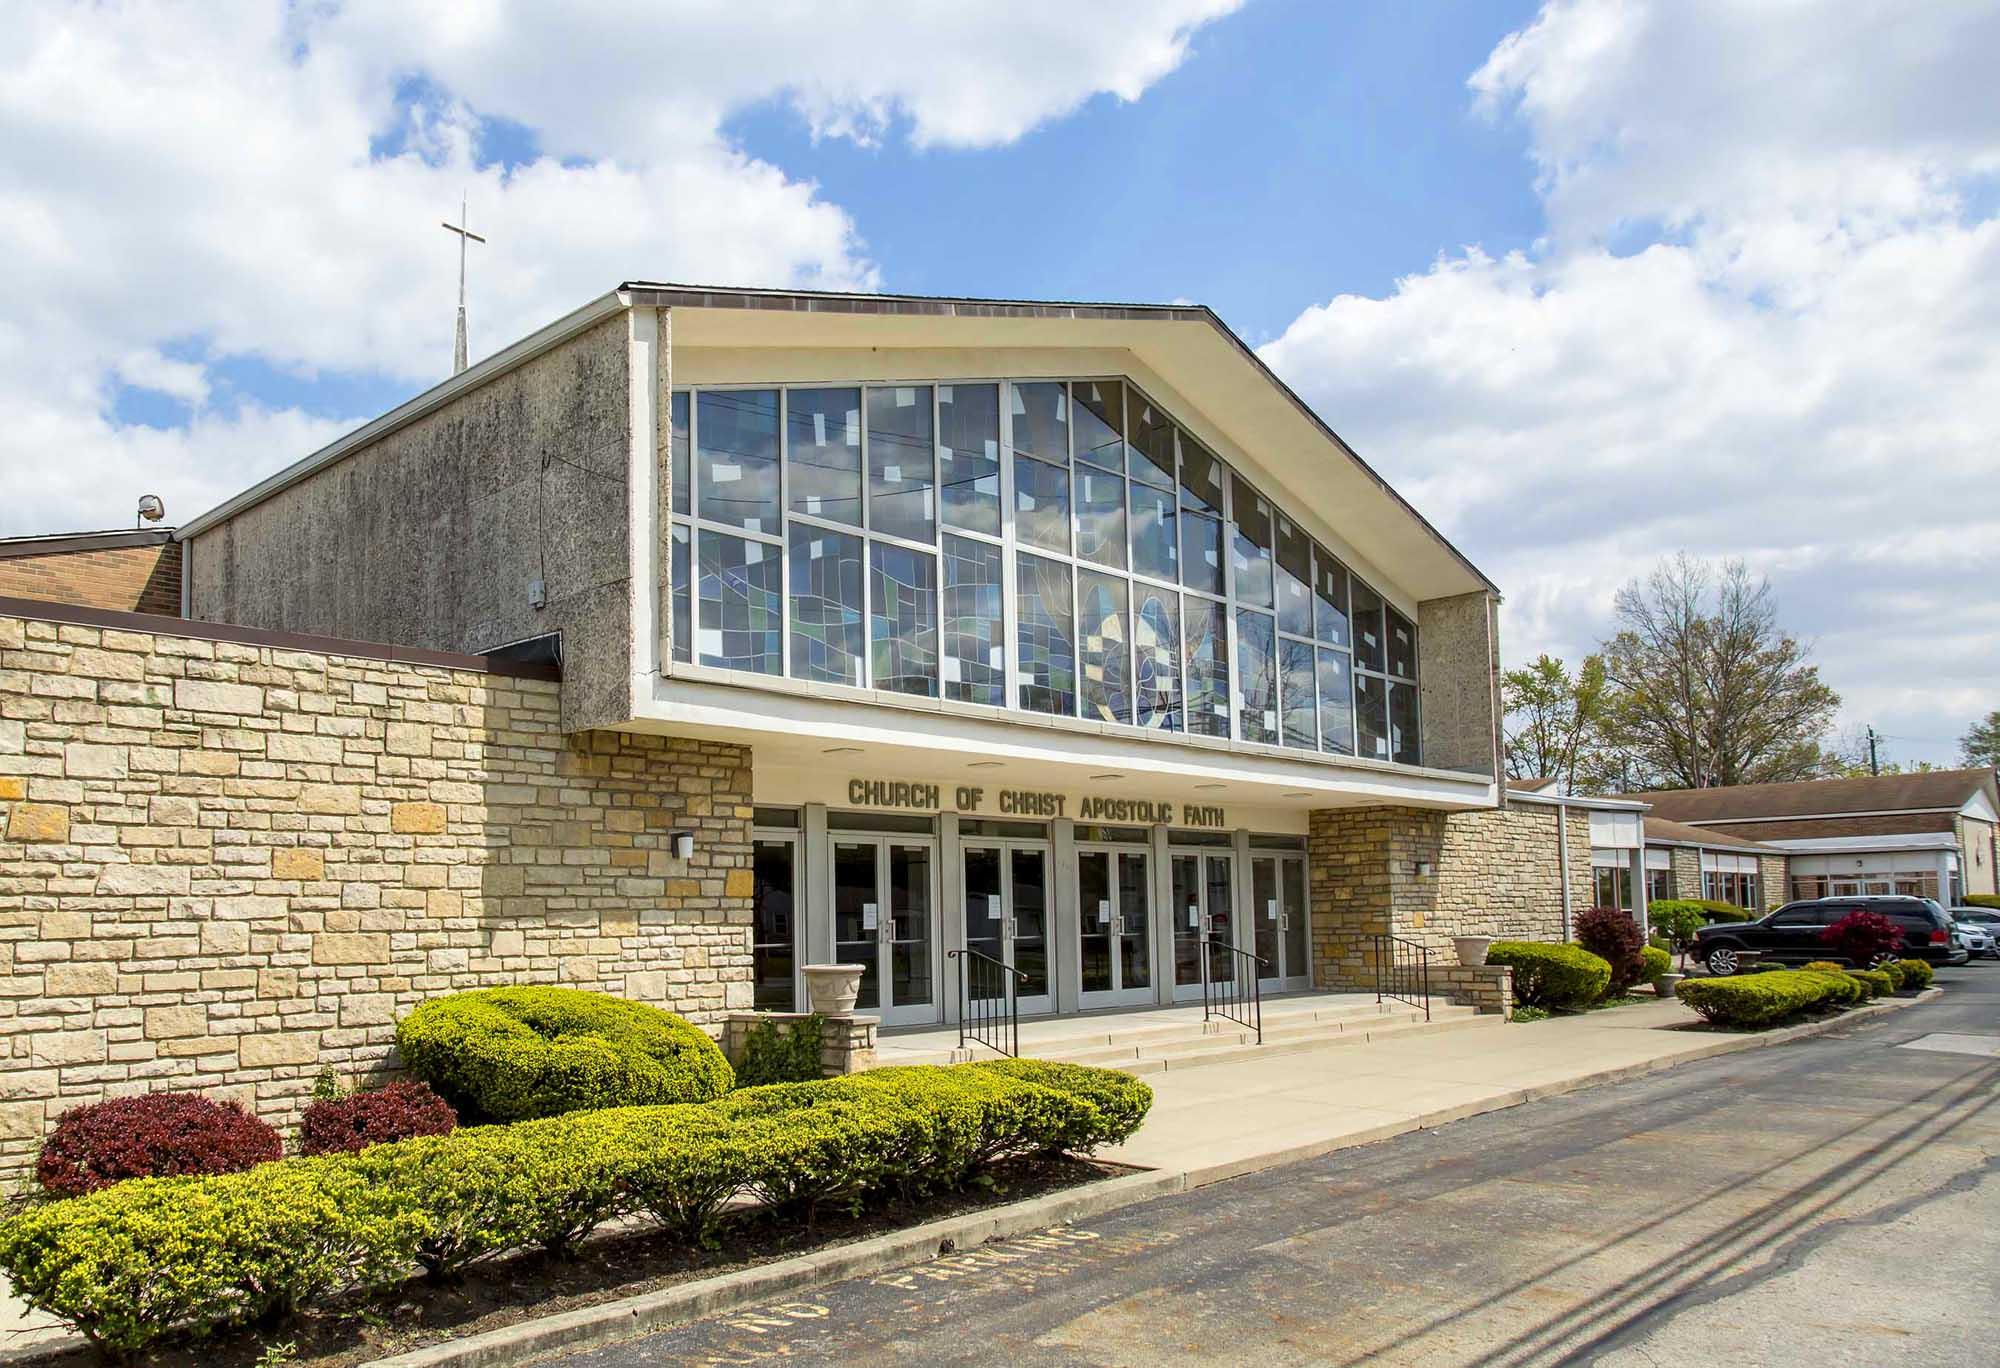 Church of Christ of Apostolic Faith